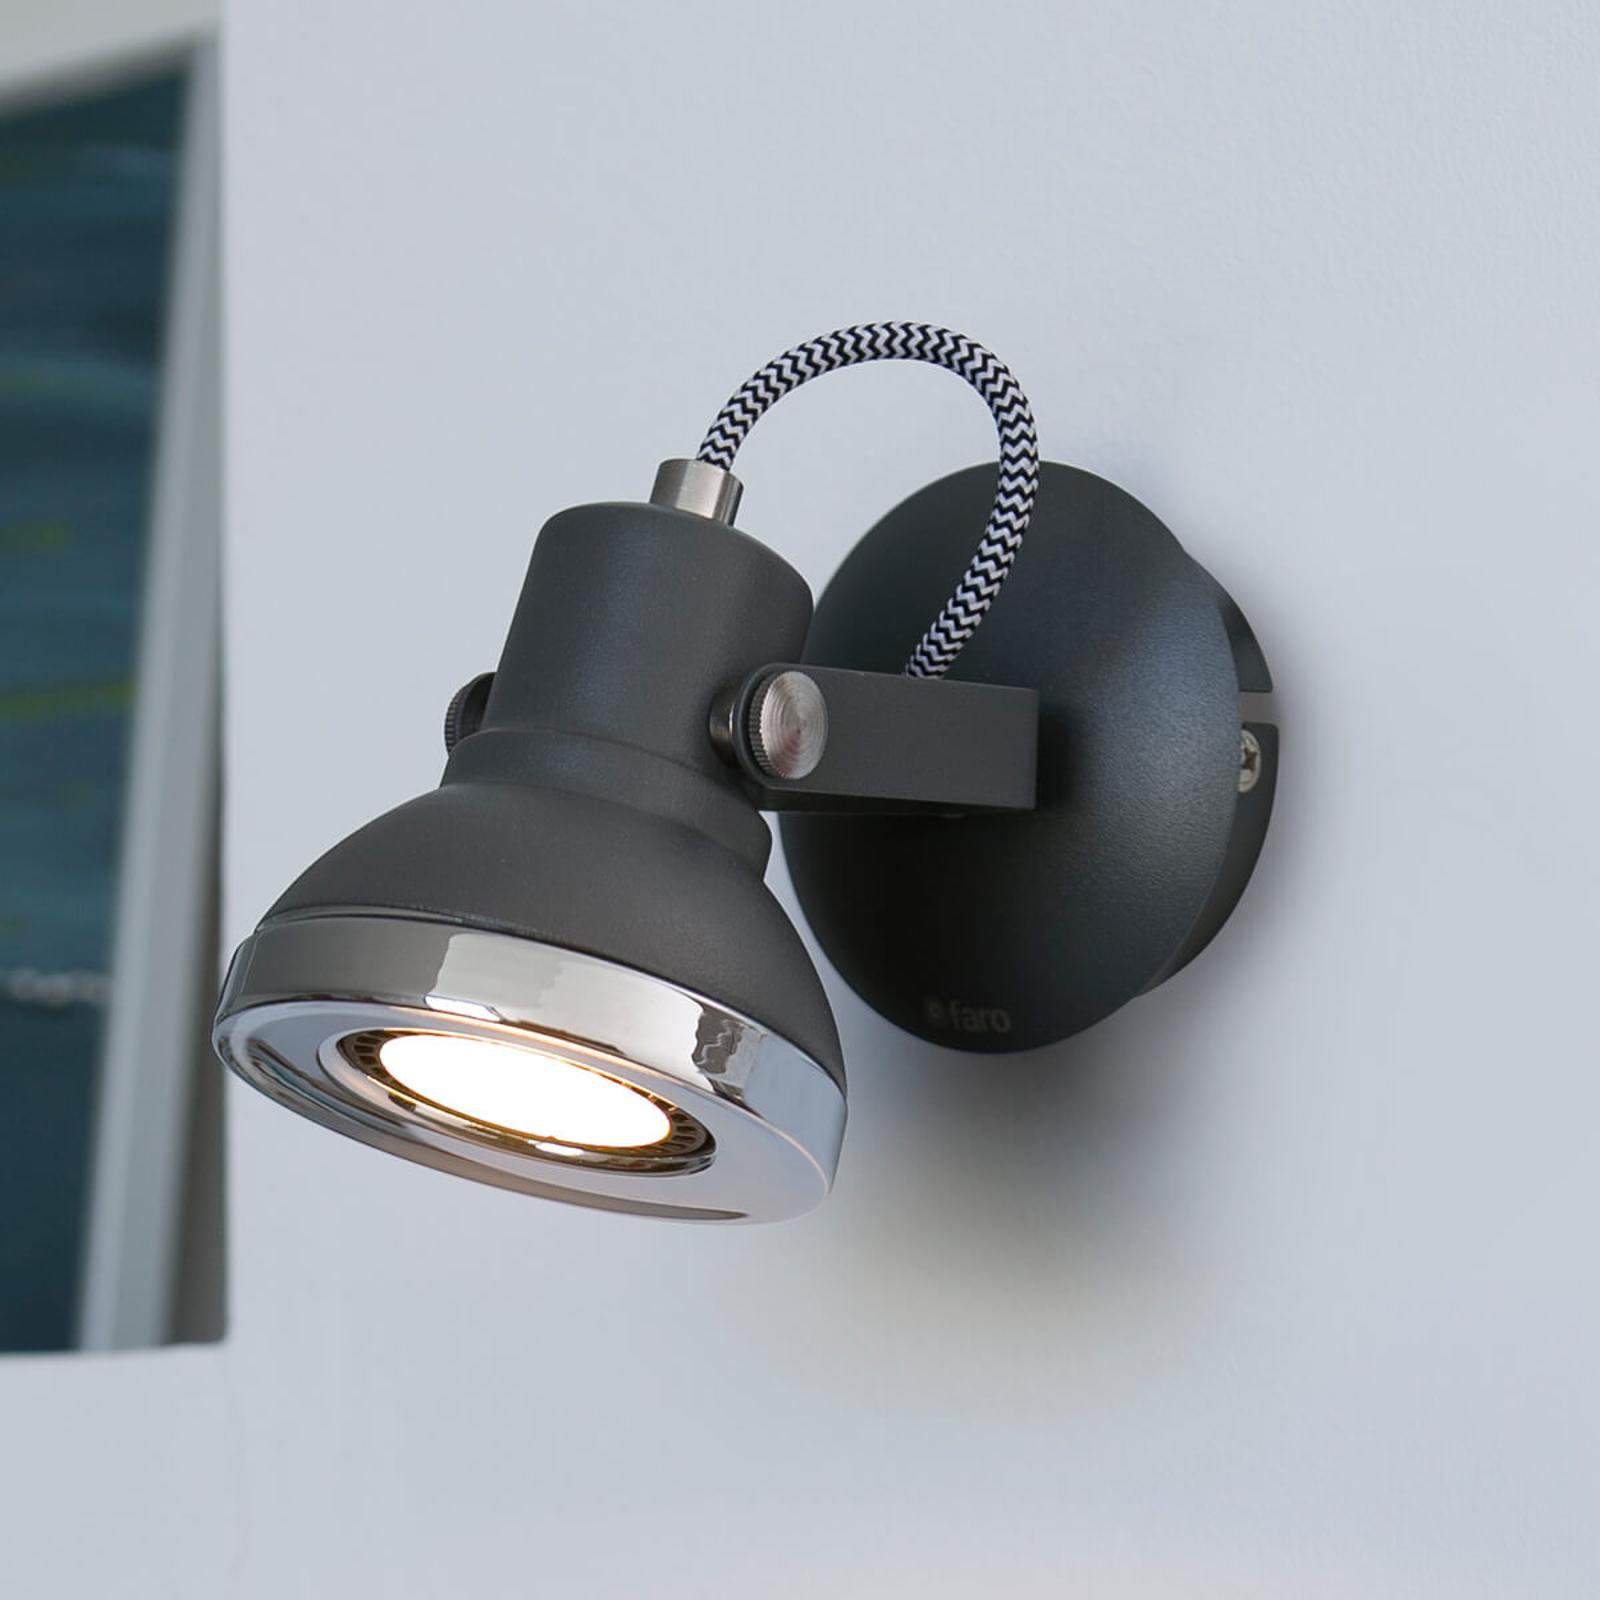 Ring - einflammiger LED-Wandstrahler in Dunkelgrau